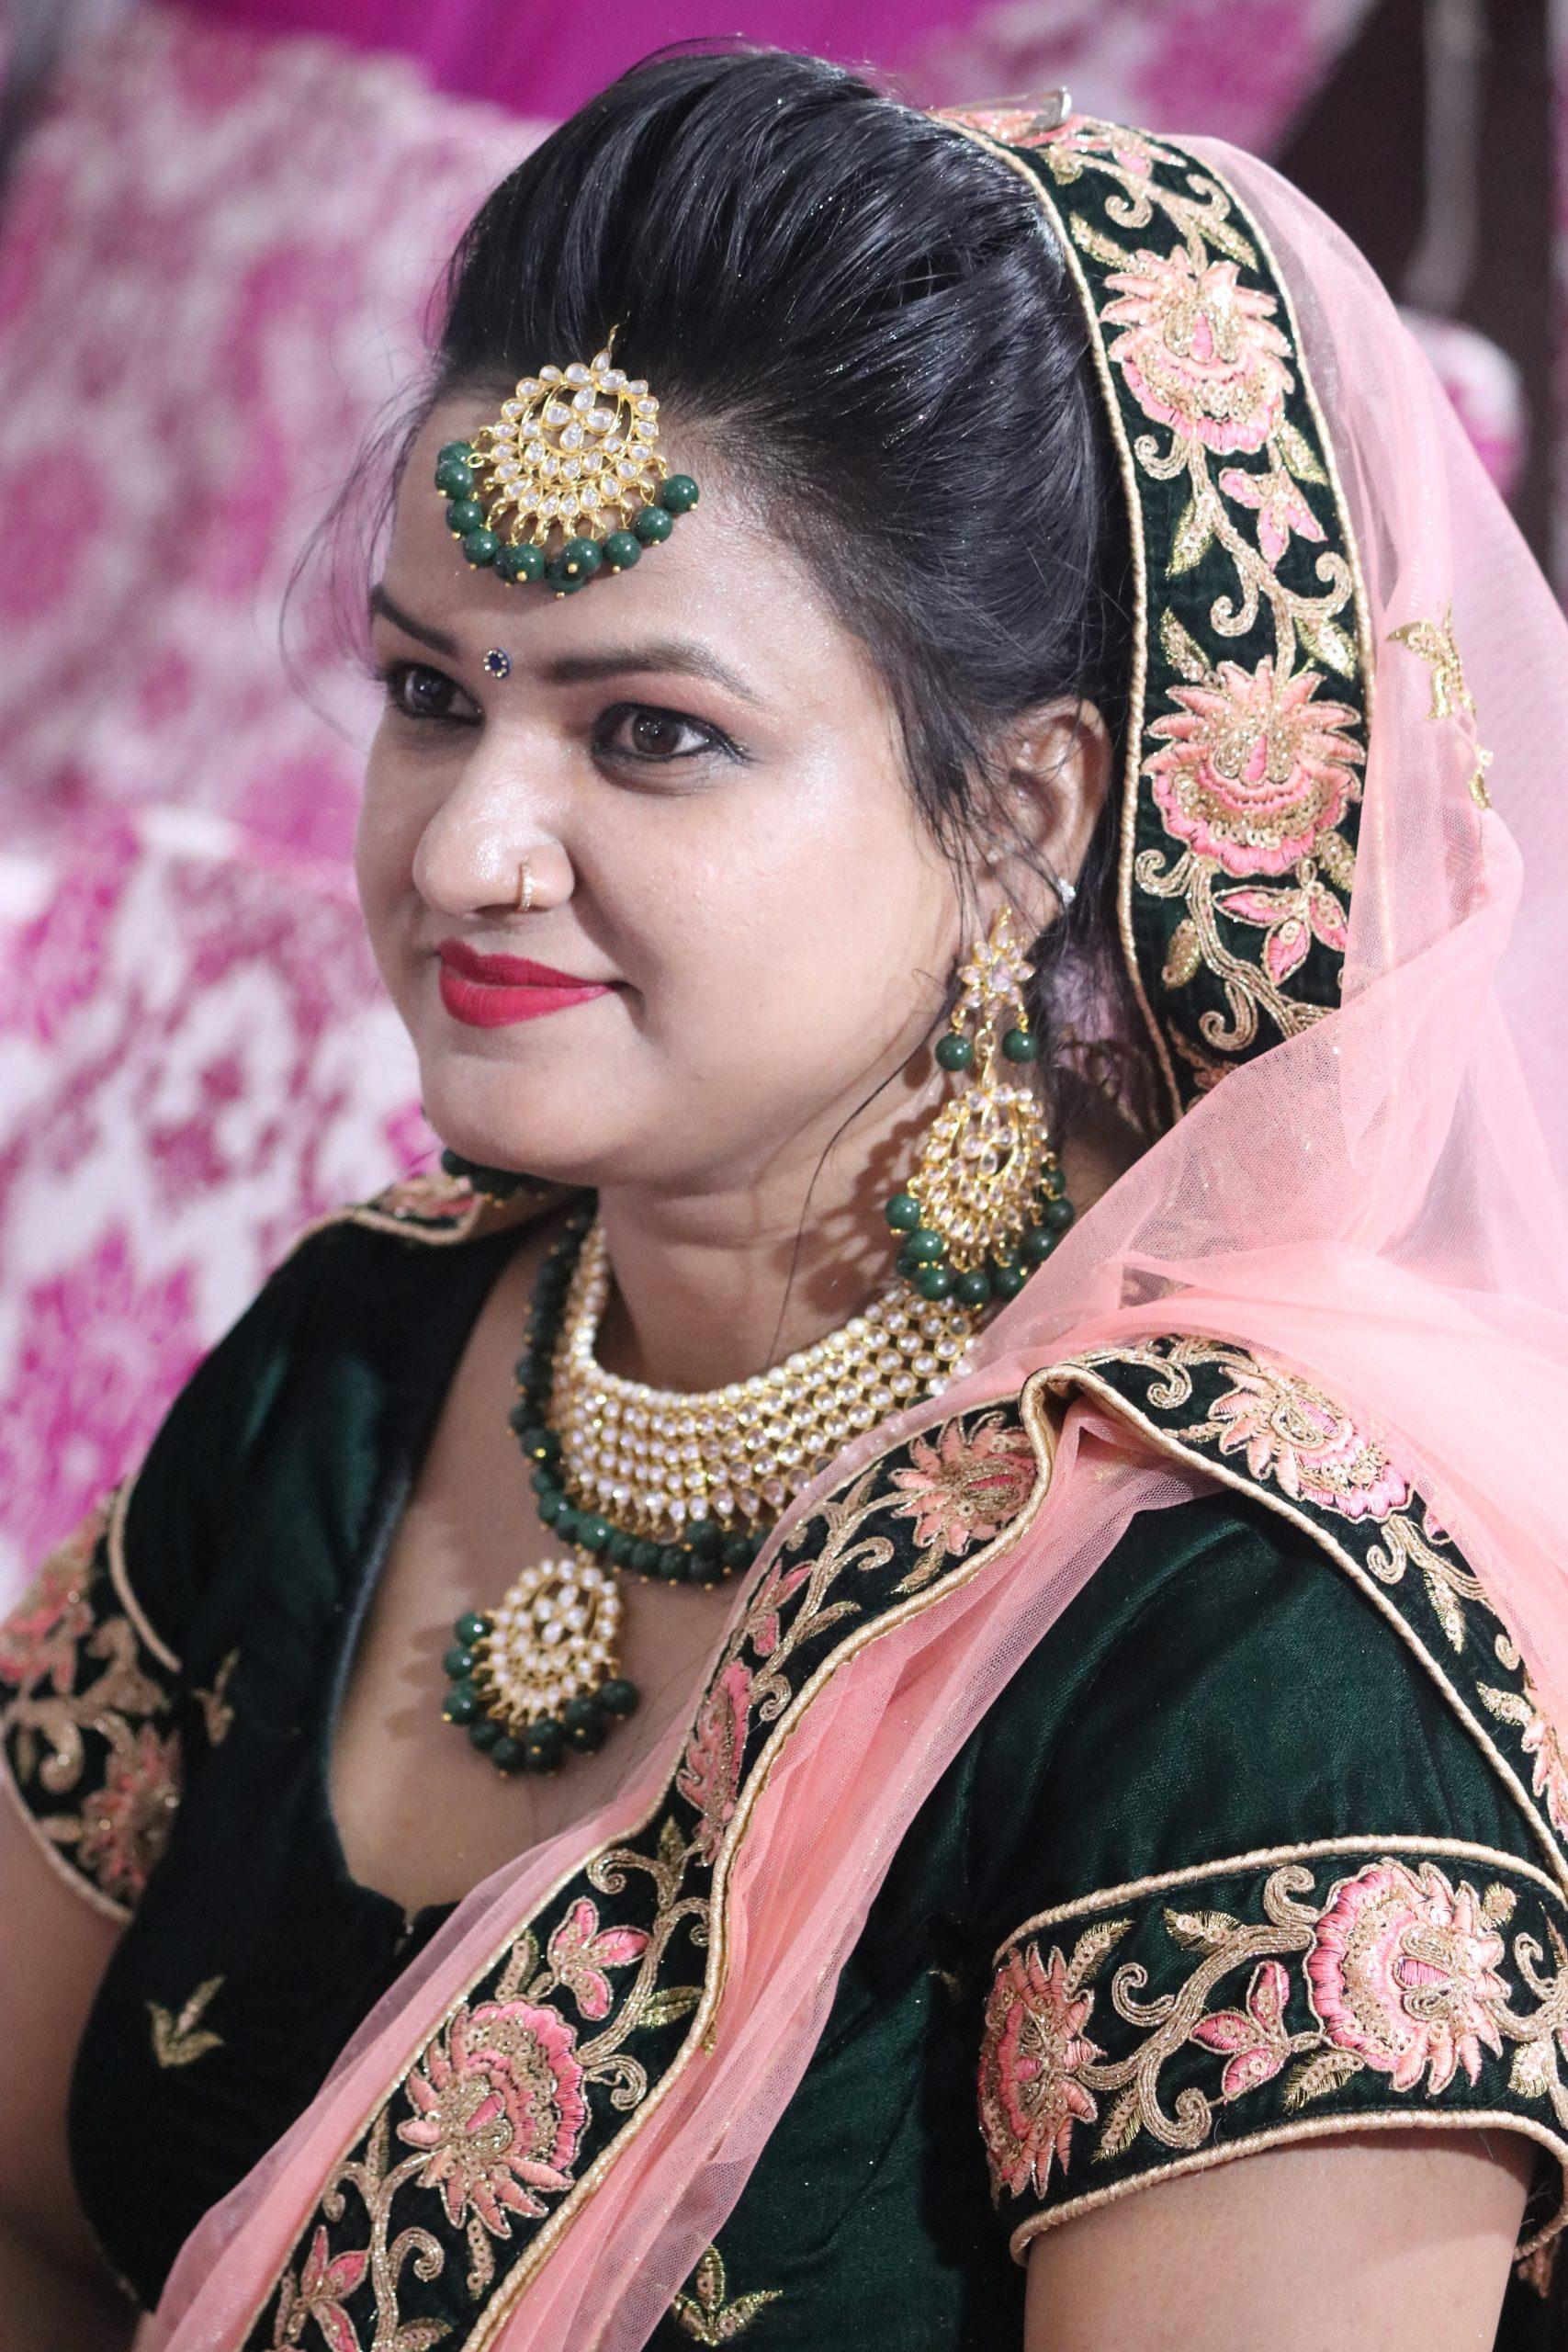 A beautiful Indian woman